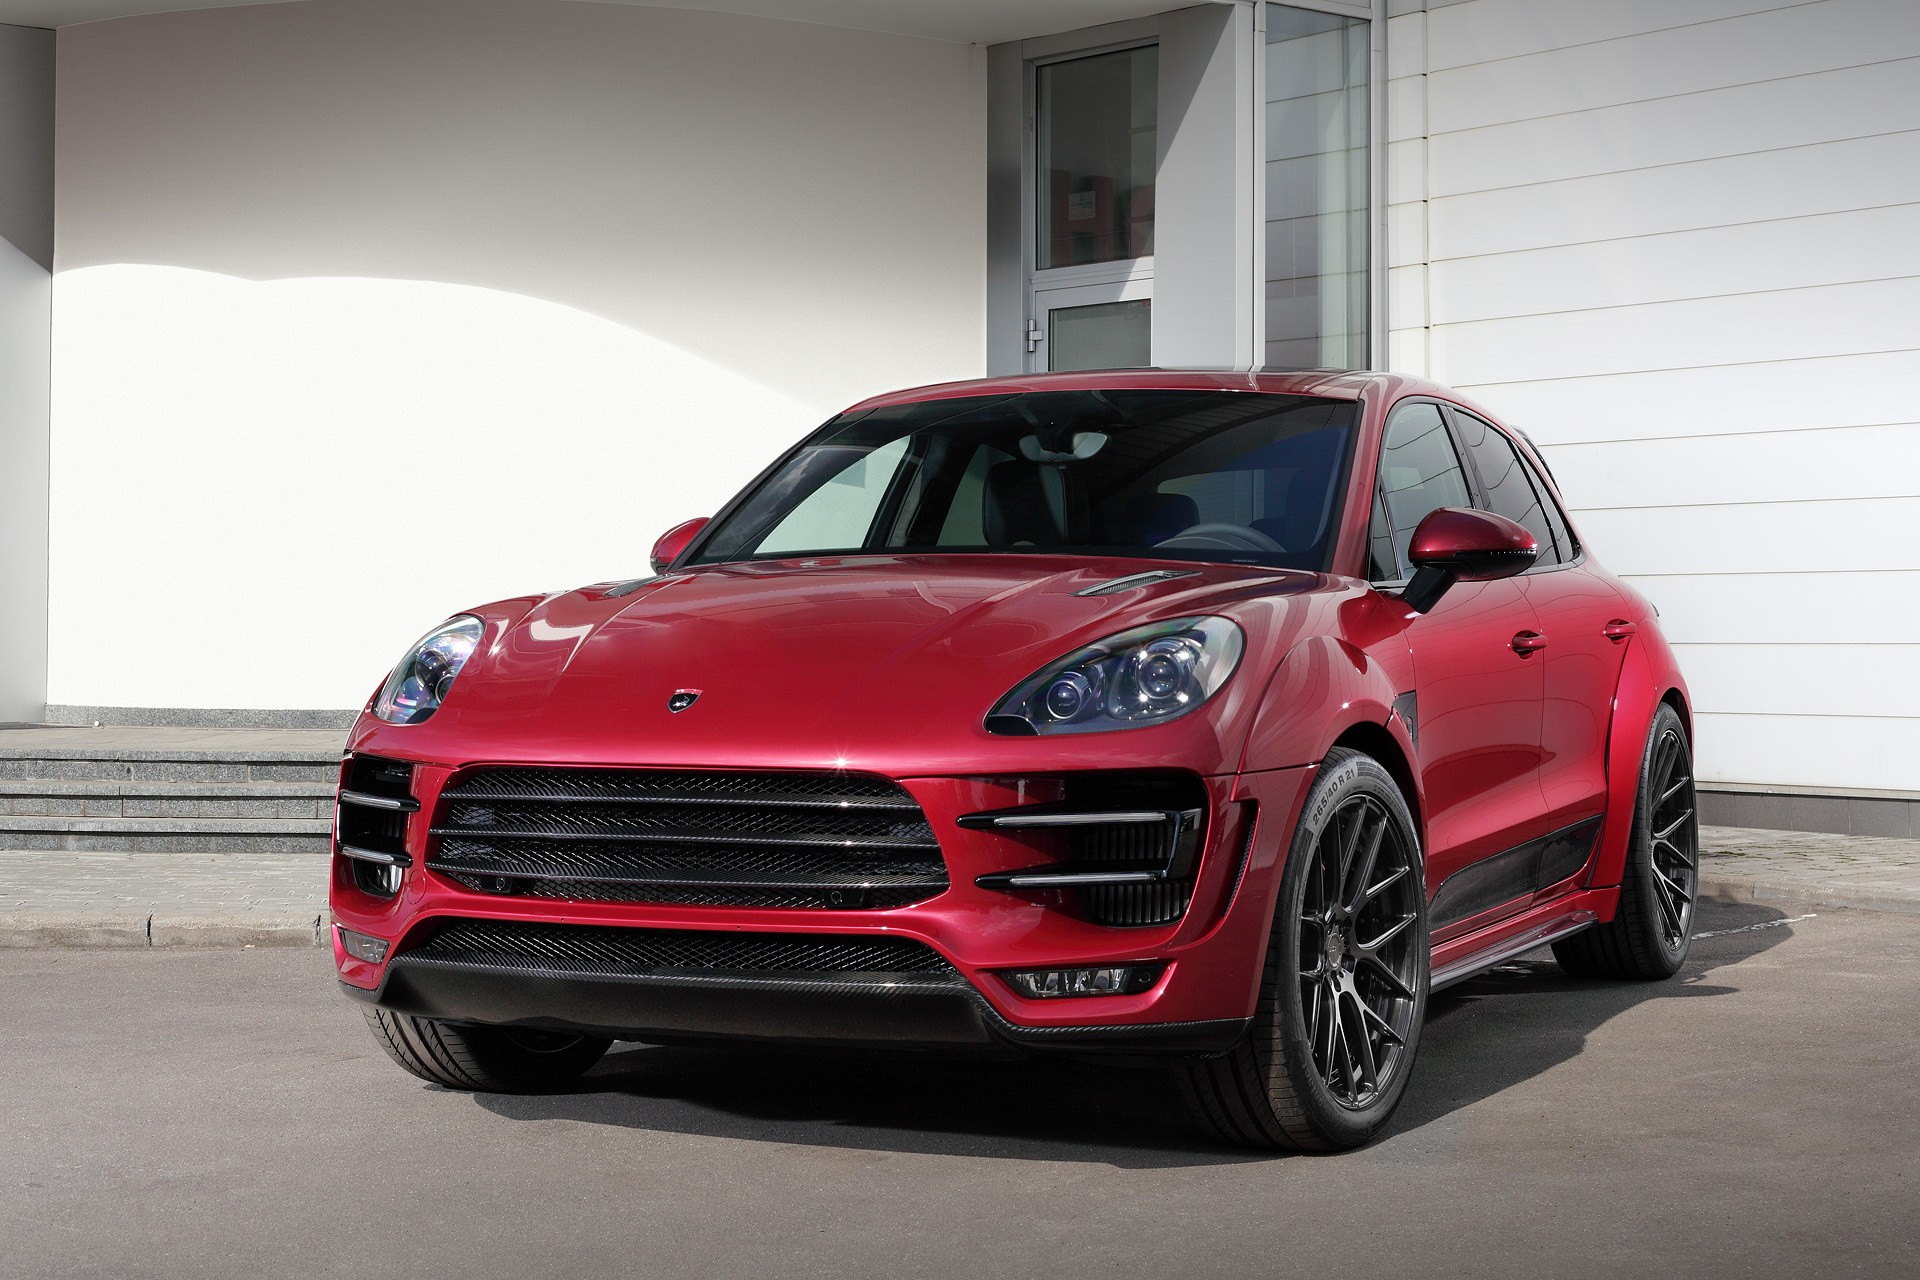 Porsche Macan URSA. RED / TopCar on honda fit in red, kia cadenza in red, range rover in red, dodge journey in red, maserati in red, honda pilot in red, bentley in red, audi in red, car in red, hennessey venom gt in red, ferrari in red, bugatti in red, honda civic in red, ford flex in red, ford focus in red, kia optima in red, lincoln mkt in red, porsche 944 in red, subaru impreza in red, ford ecosport in red,